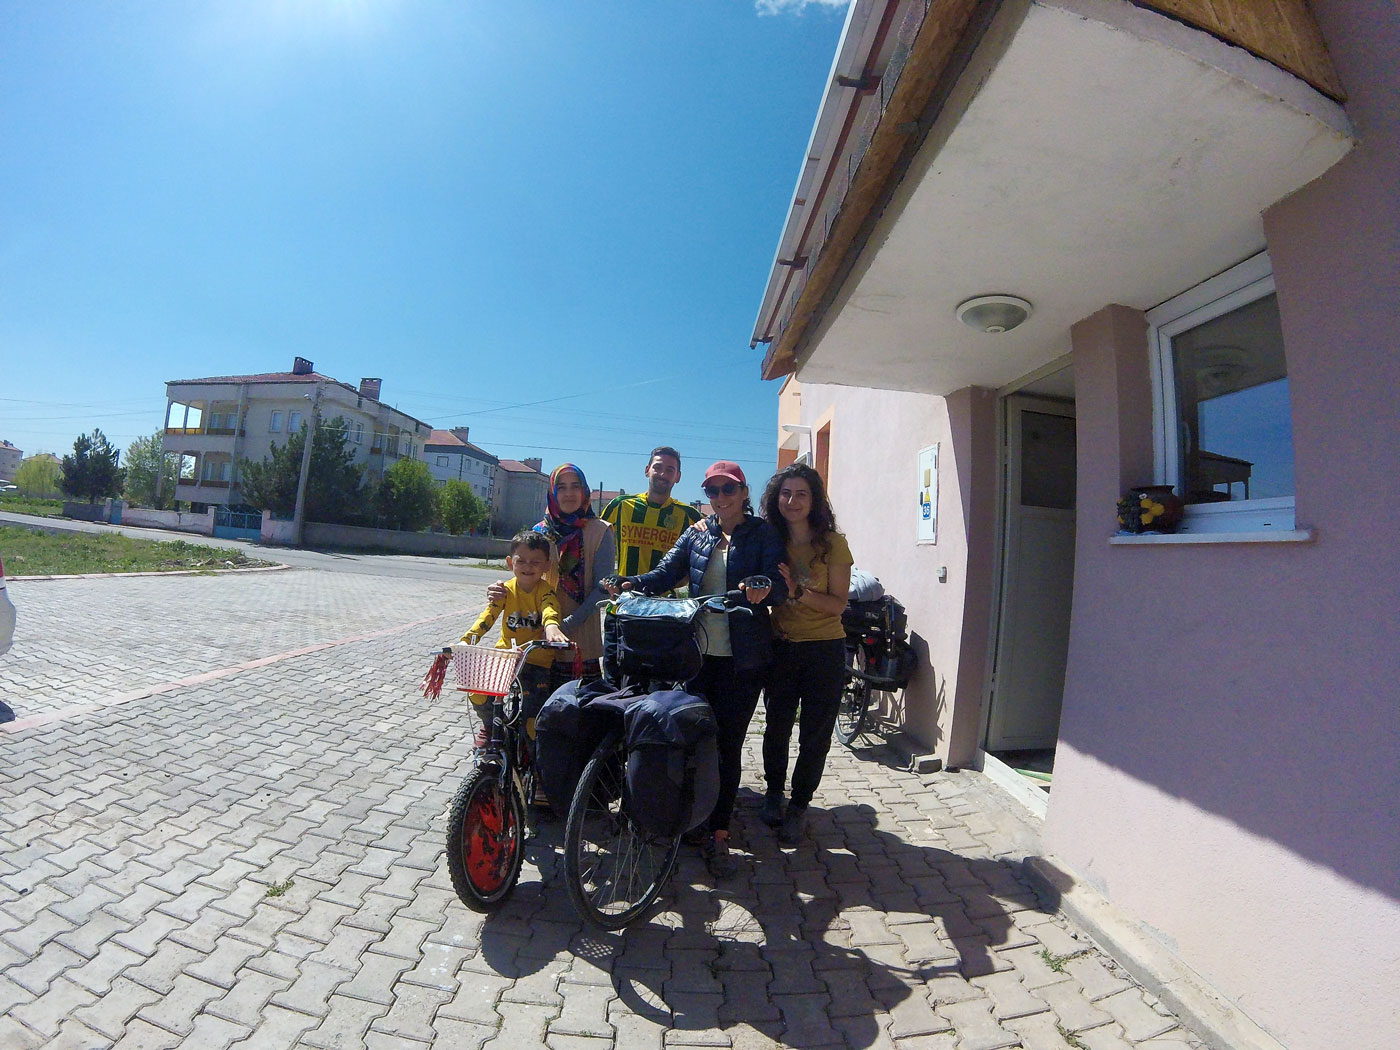 Turkey on a bike, at Tuğba's friend's house in Şarkışla. Cycling Turquey, at Tuğba's friend in Şarkışla.